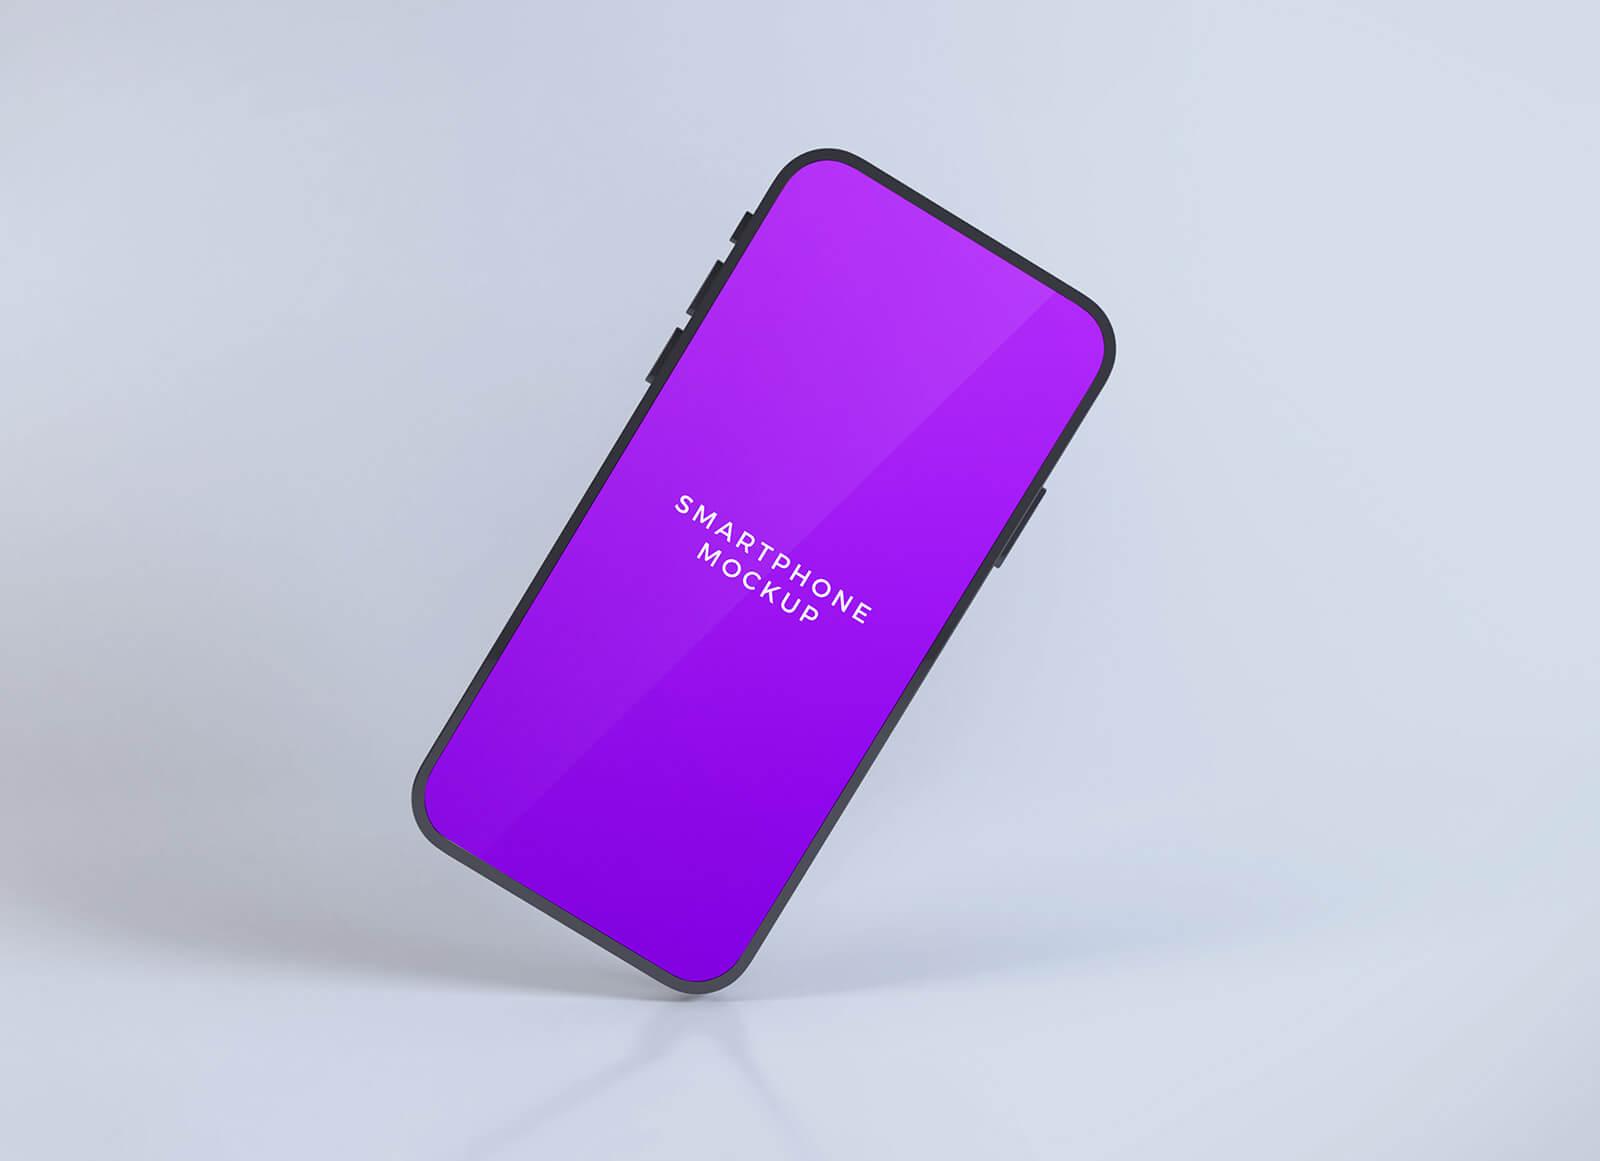 Free-Edge-To-Edge-Full-Screen-Smartphone-Mockup-PSD